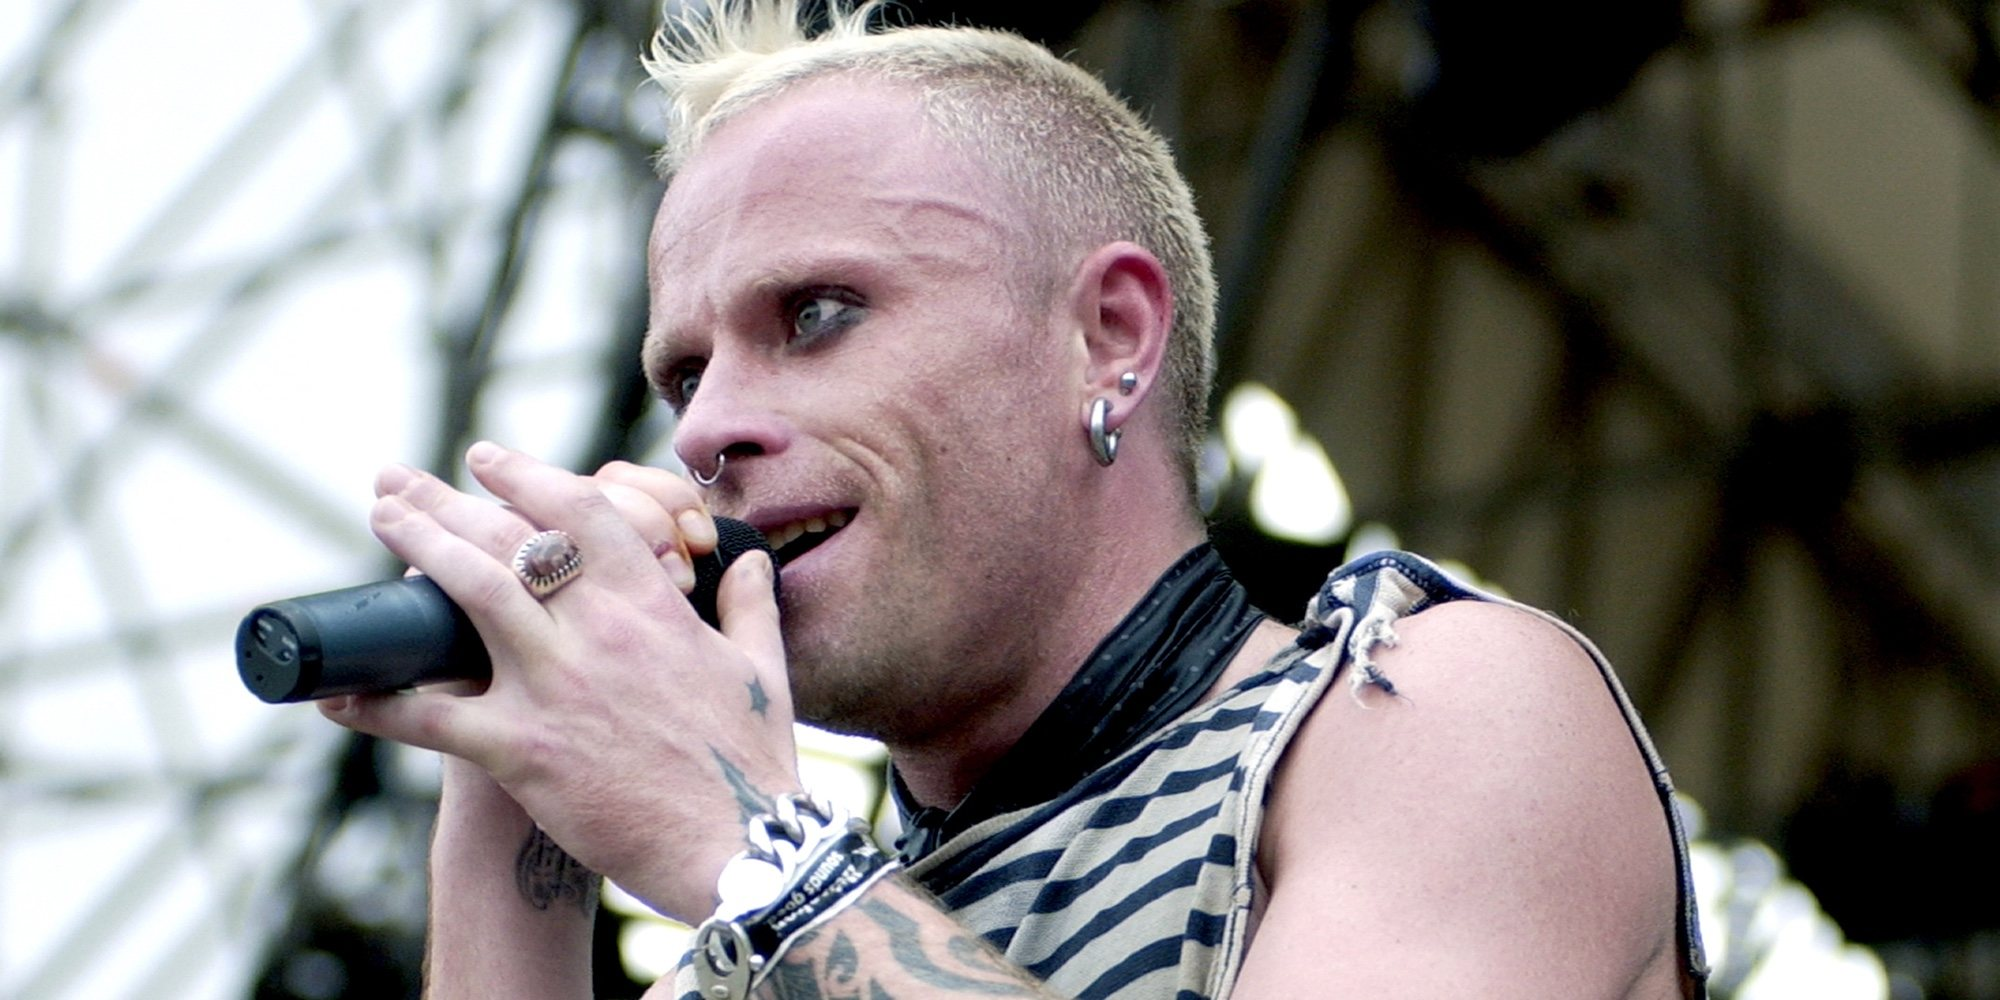 La autopsia de Keith Flint confirma que el vocalista de The Prodigy se suicidó